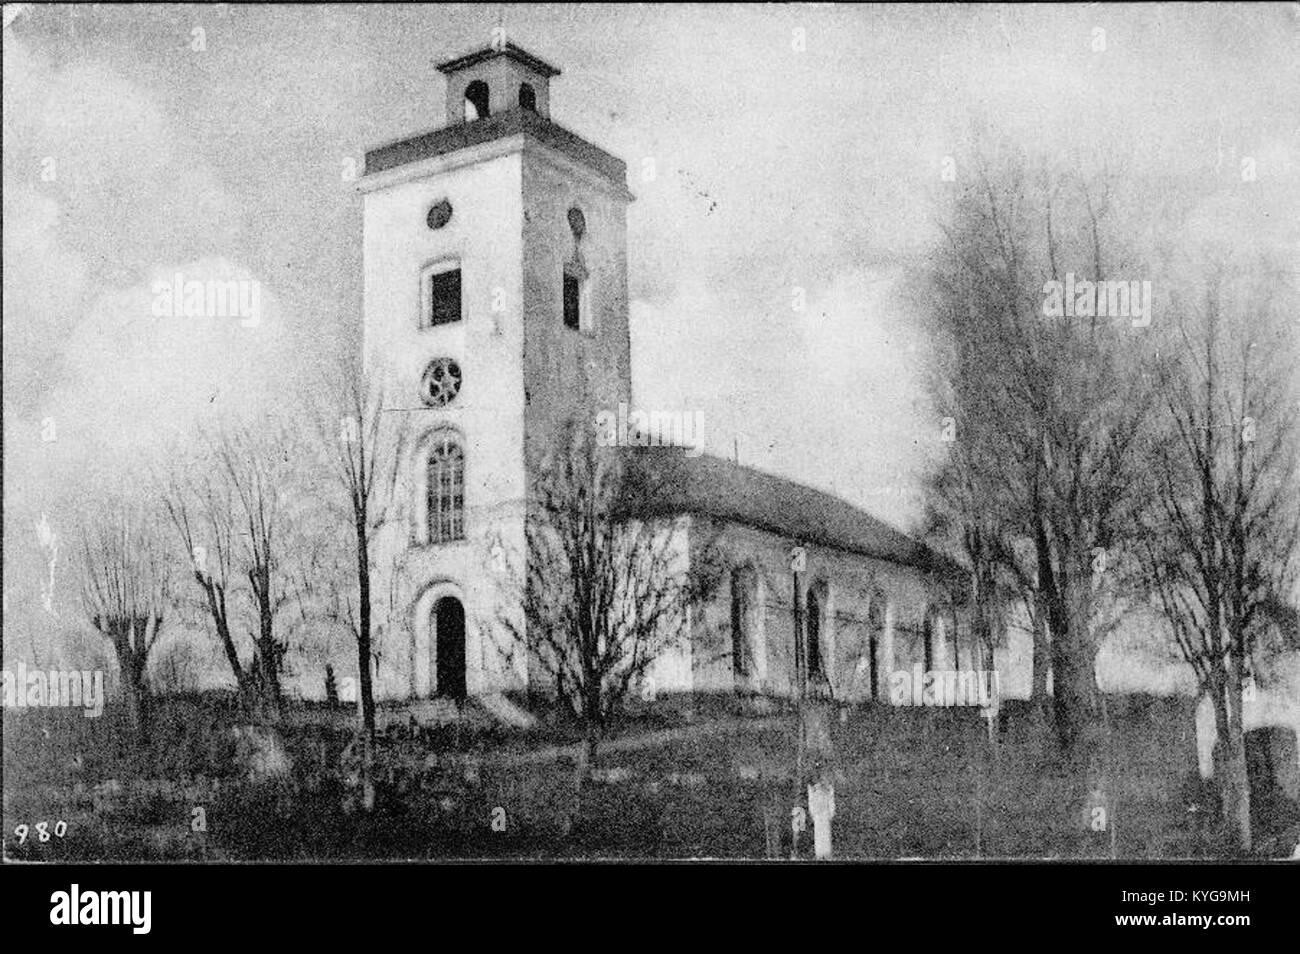 Rådmansö kyrka - KMB - 16000200127782 Foto Stock